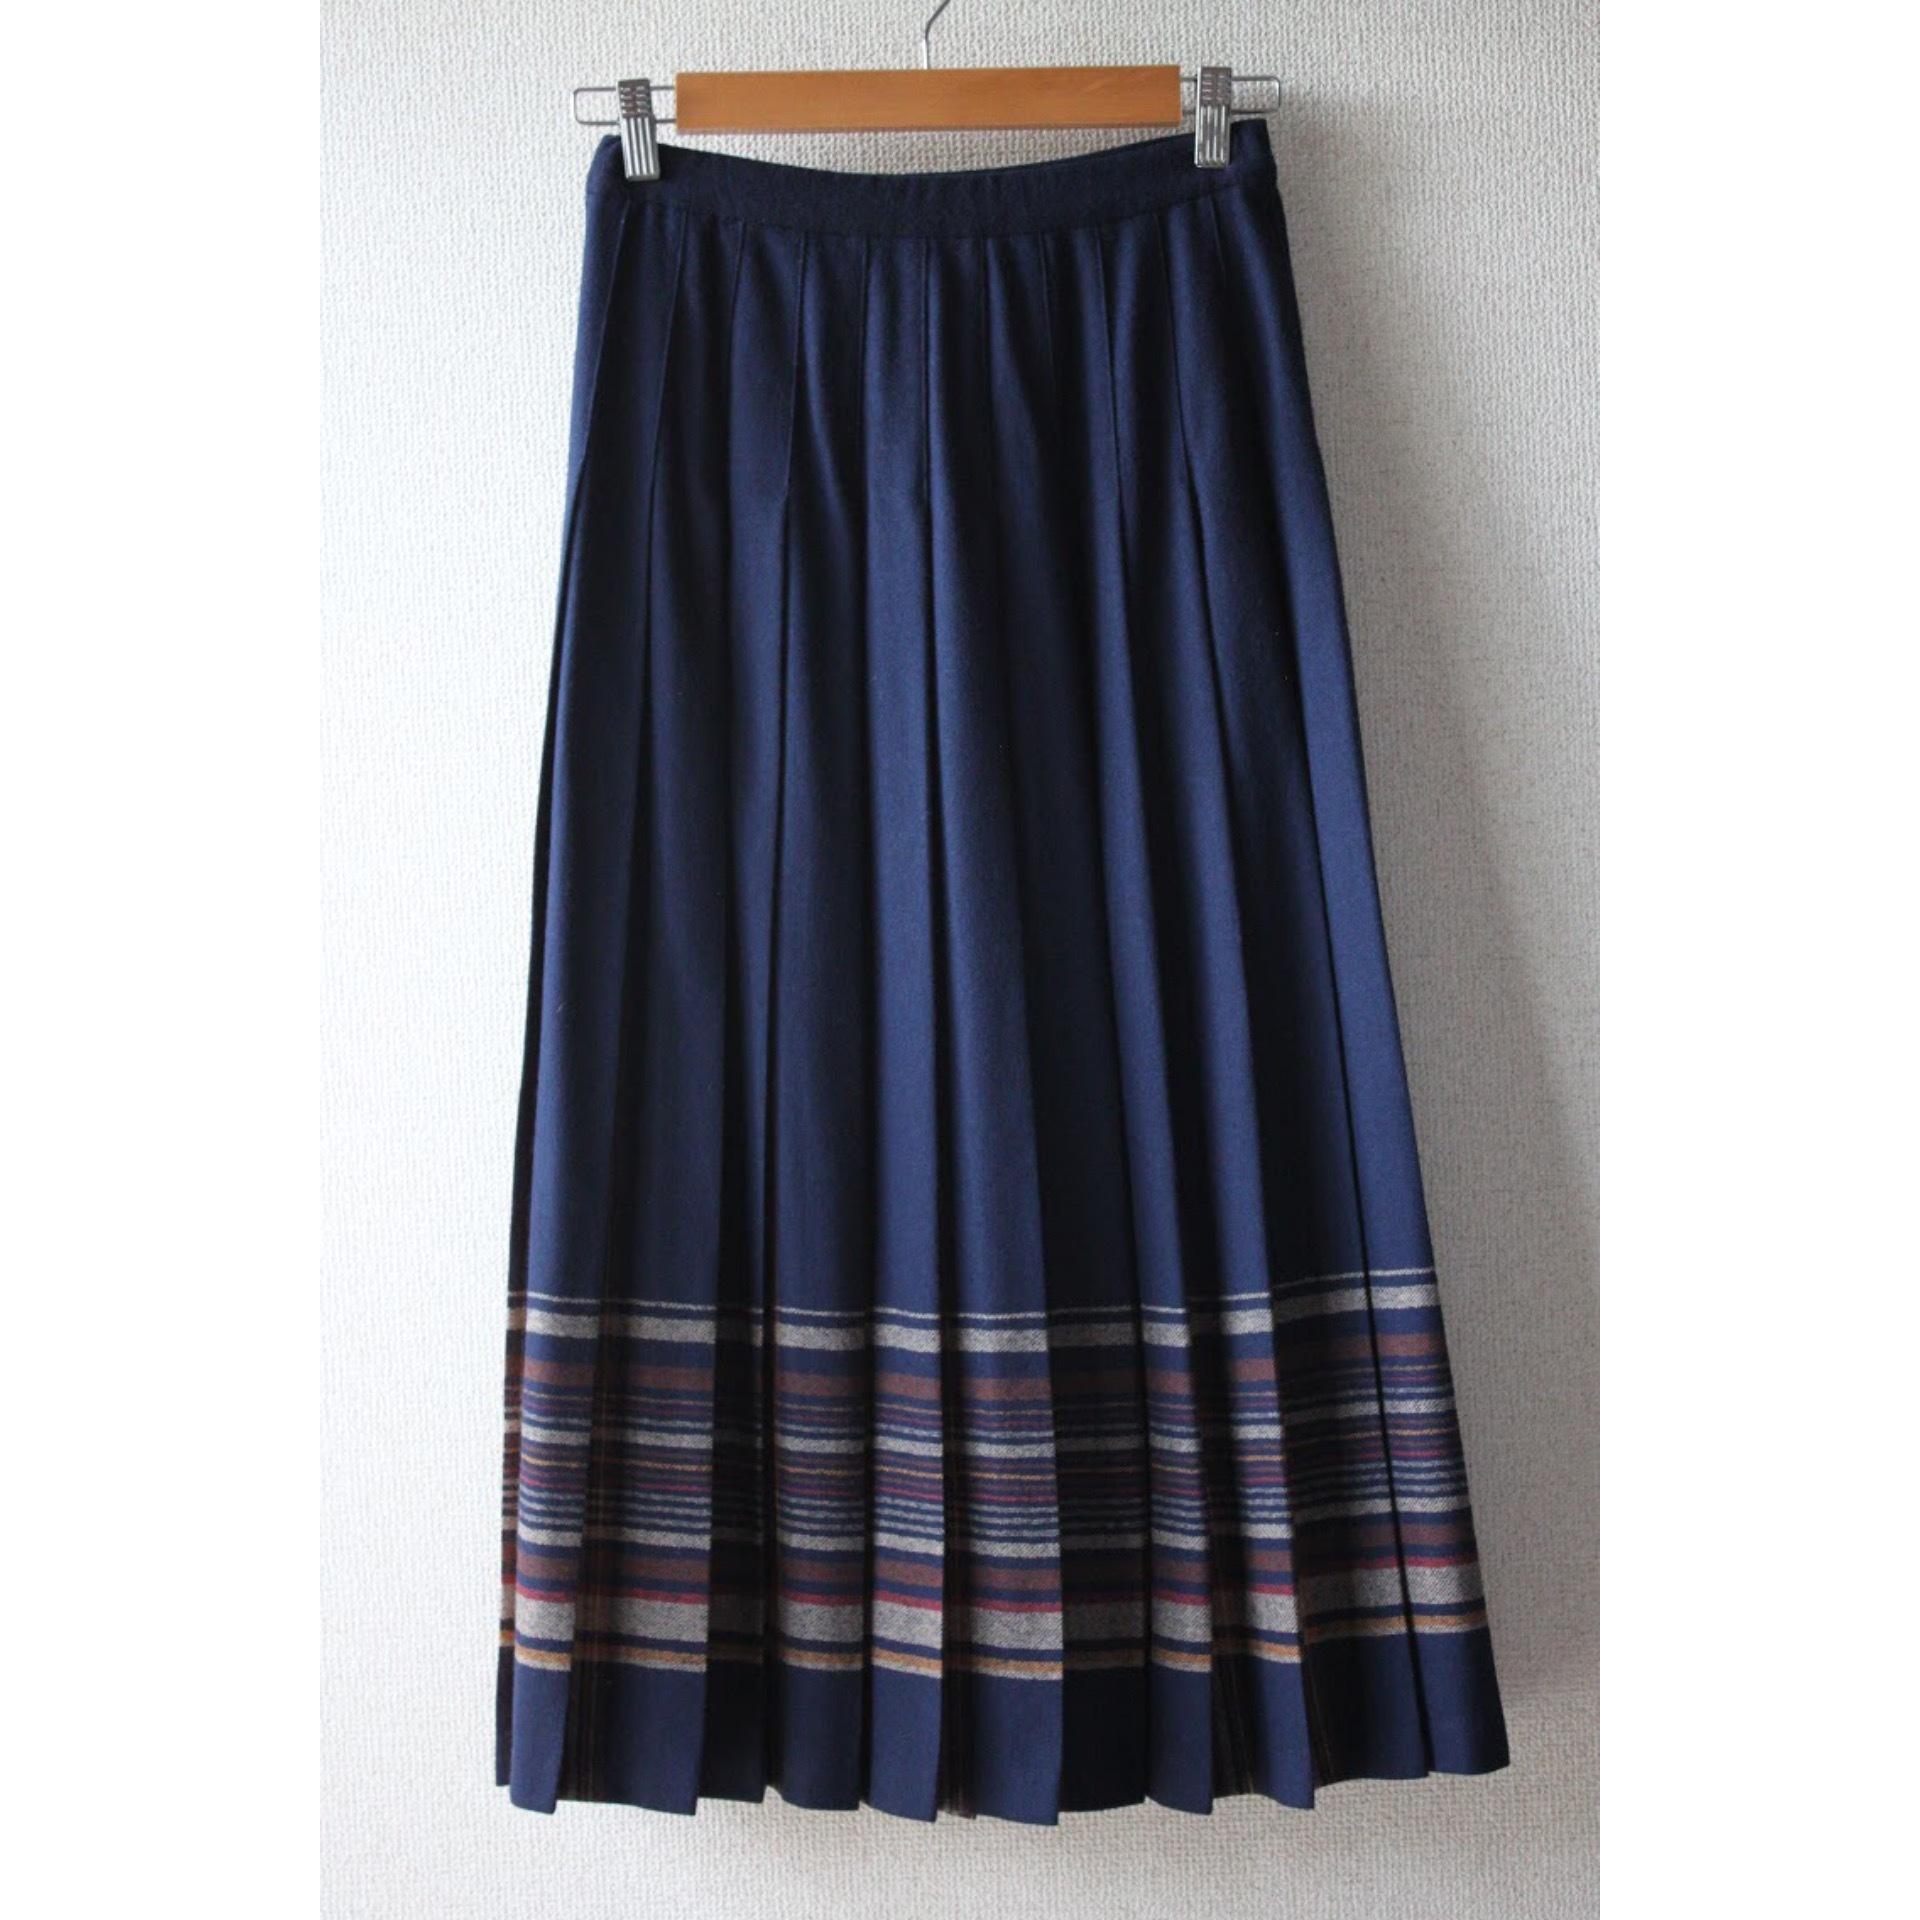 Vintage wool pleated skirt by PNDLETON